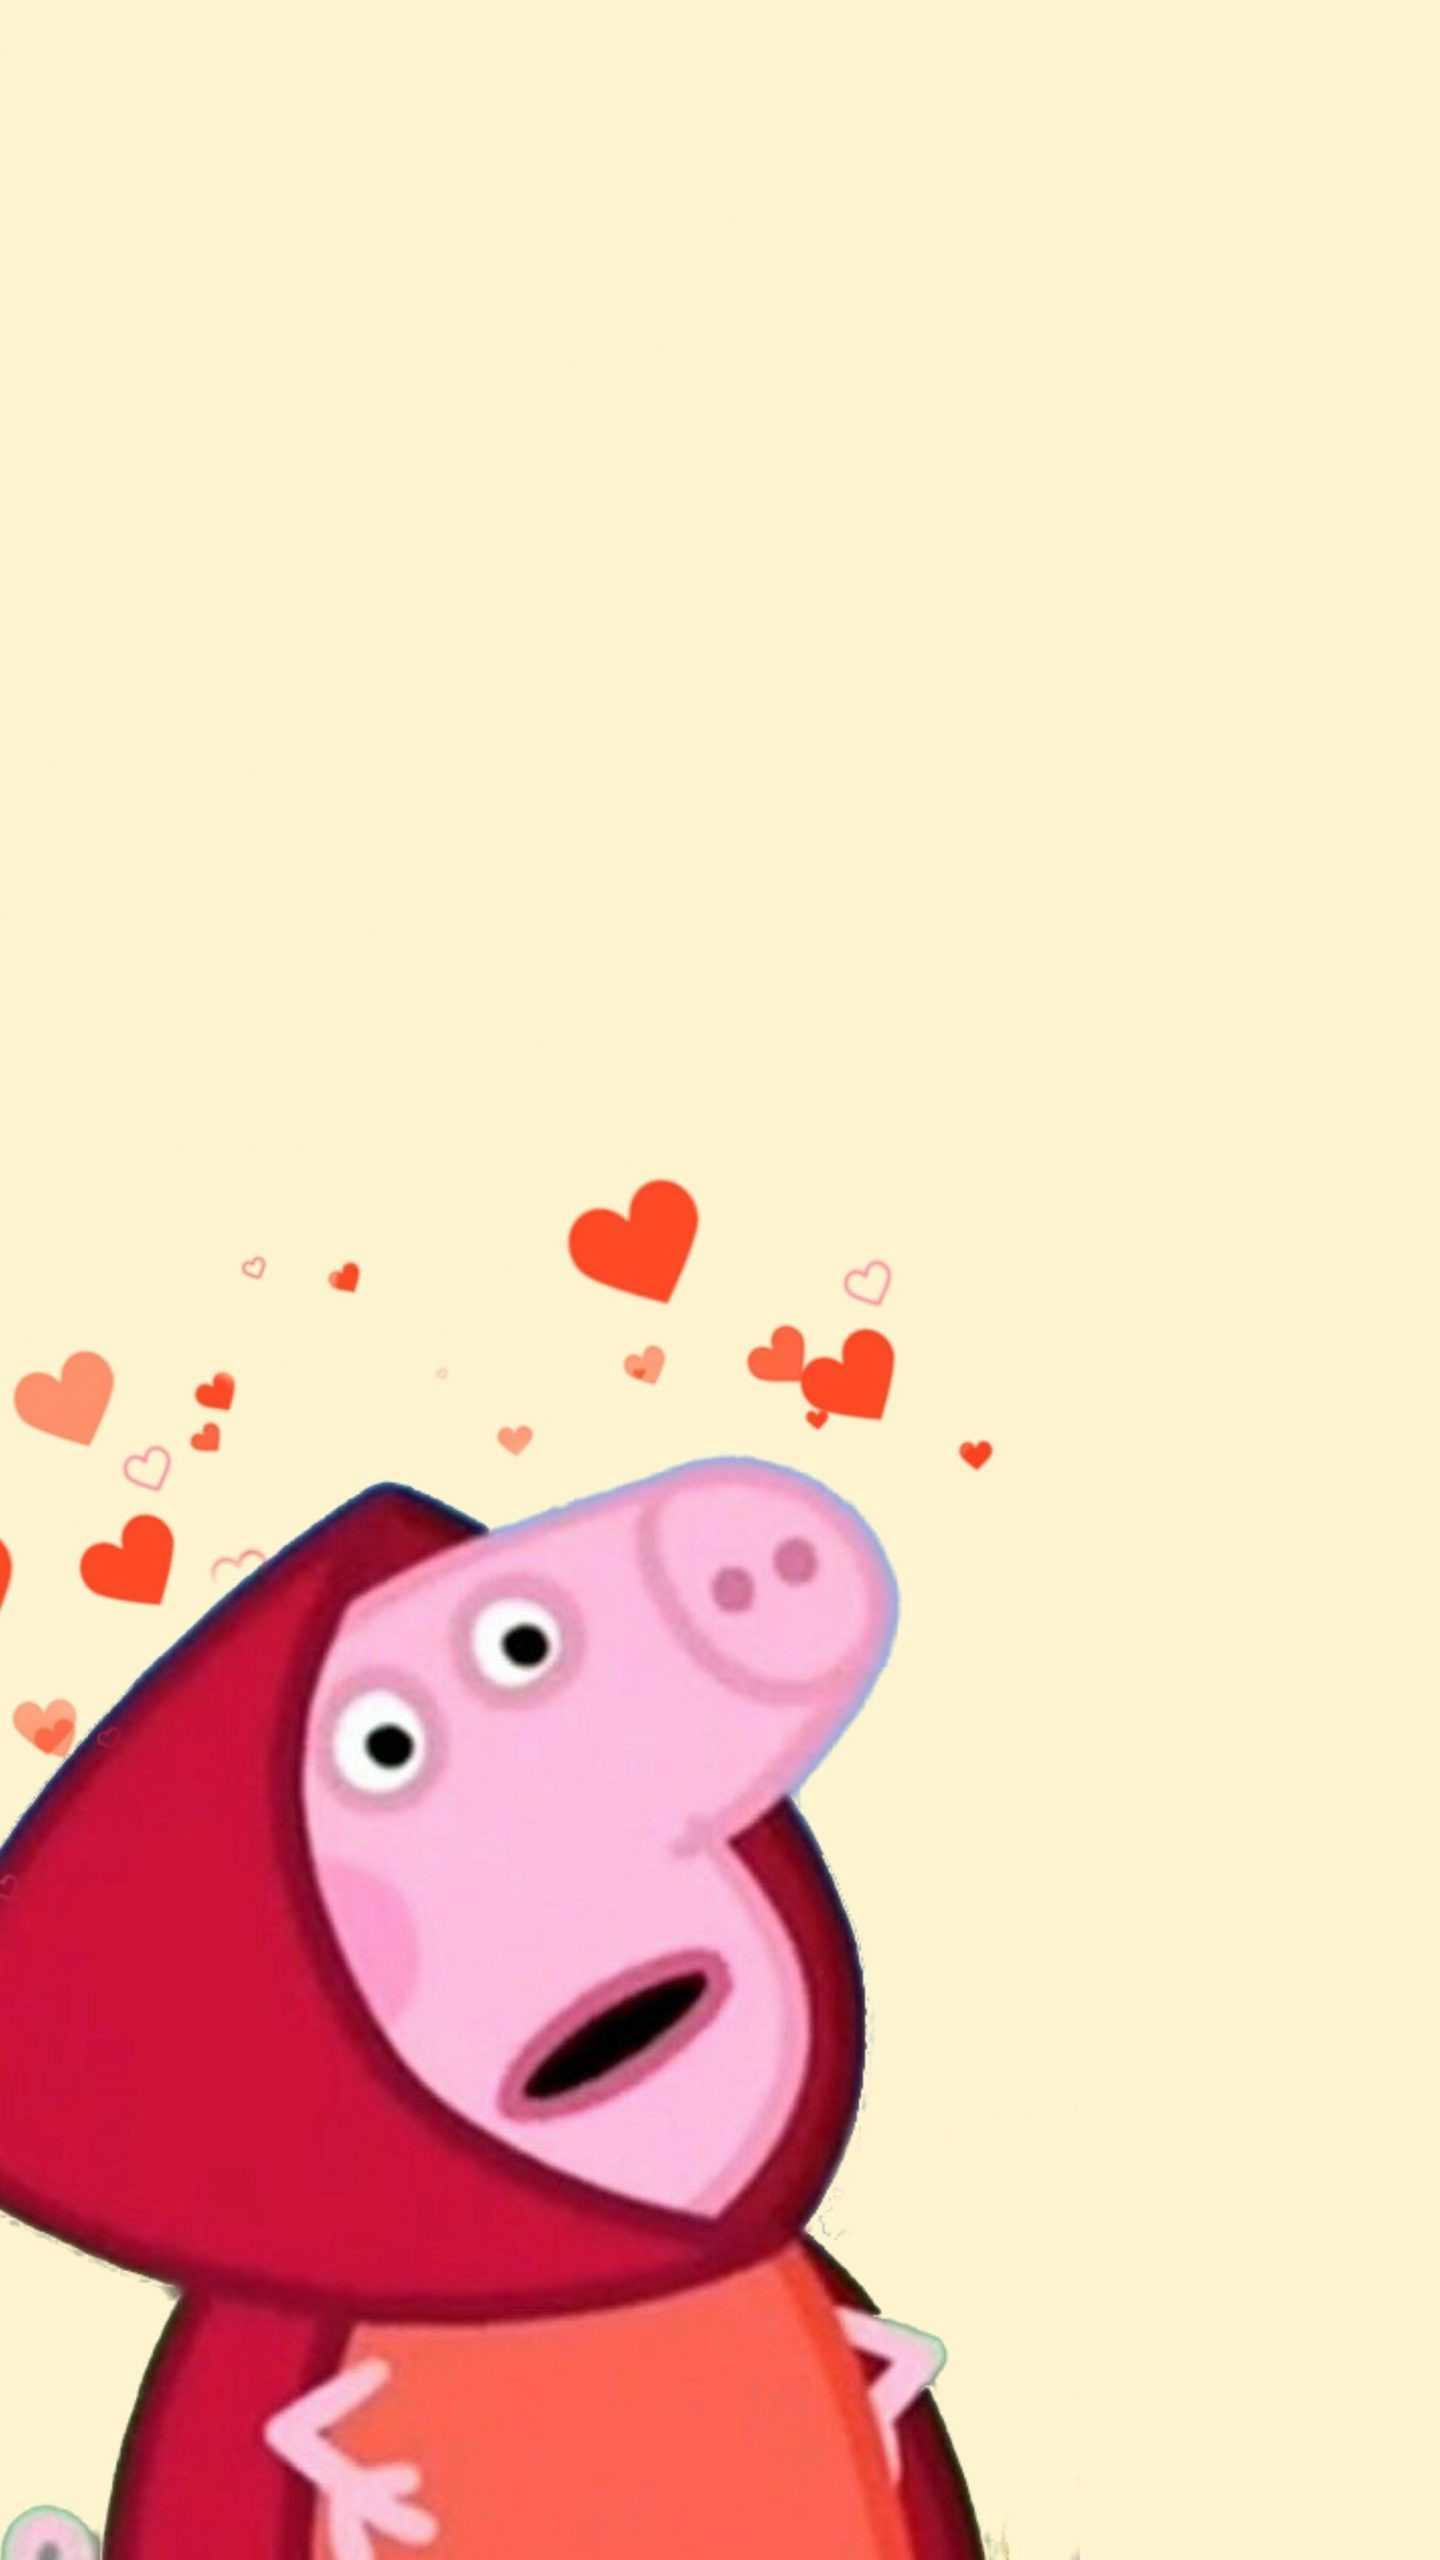 Peppa Pig Birthday Wallpapers - Wallpaper Cave